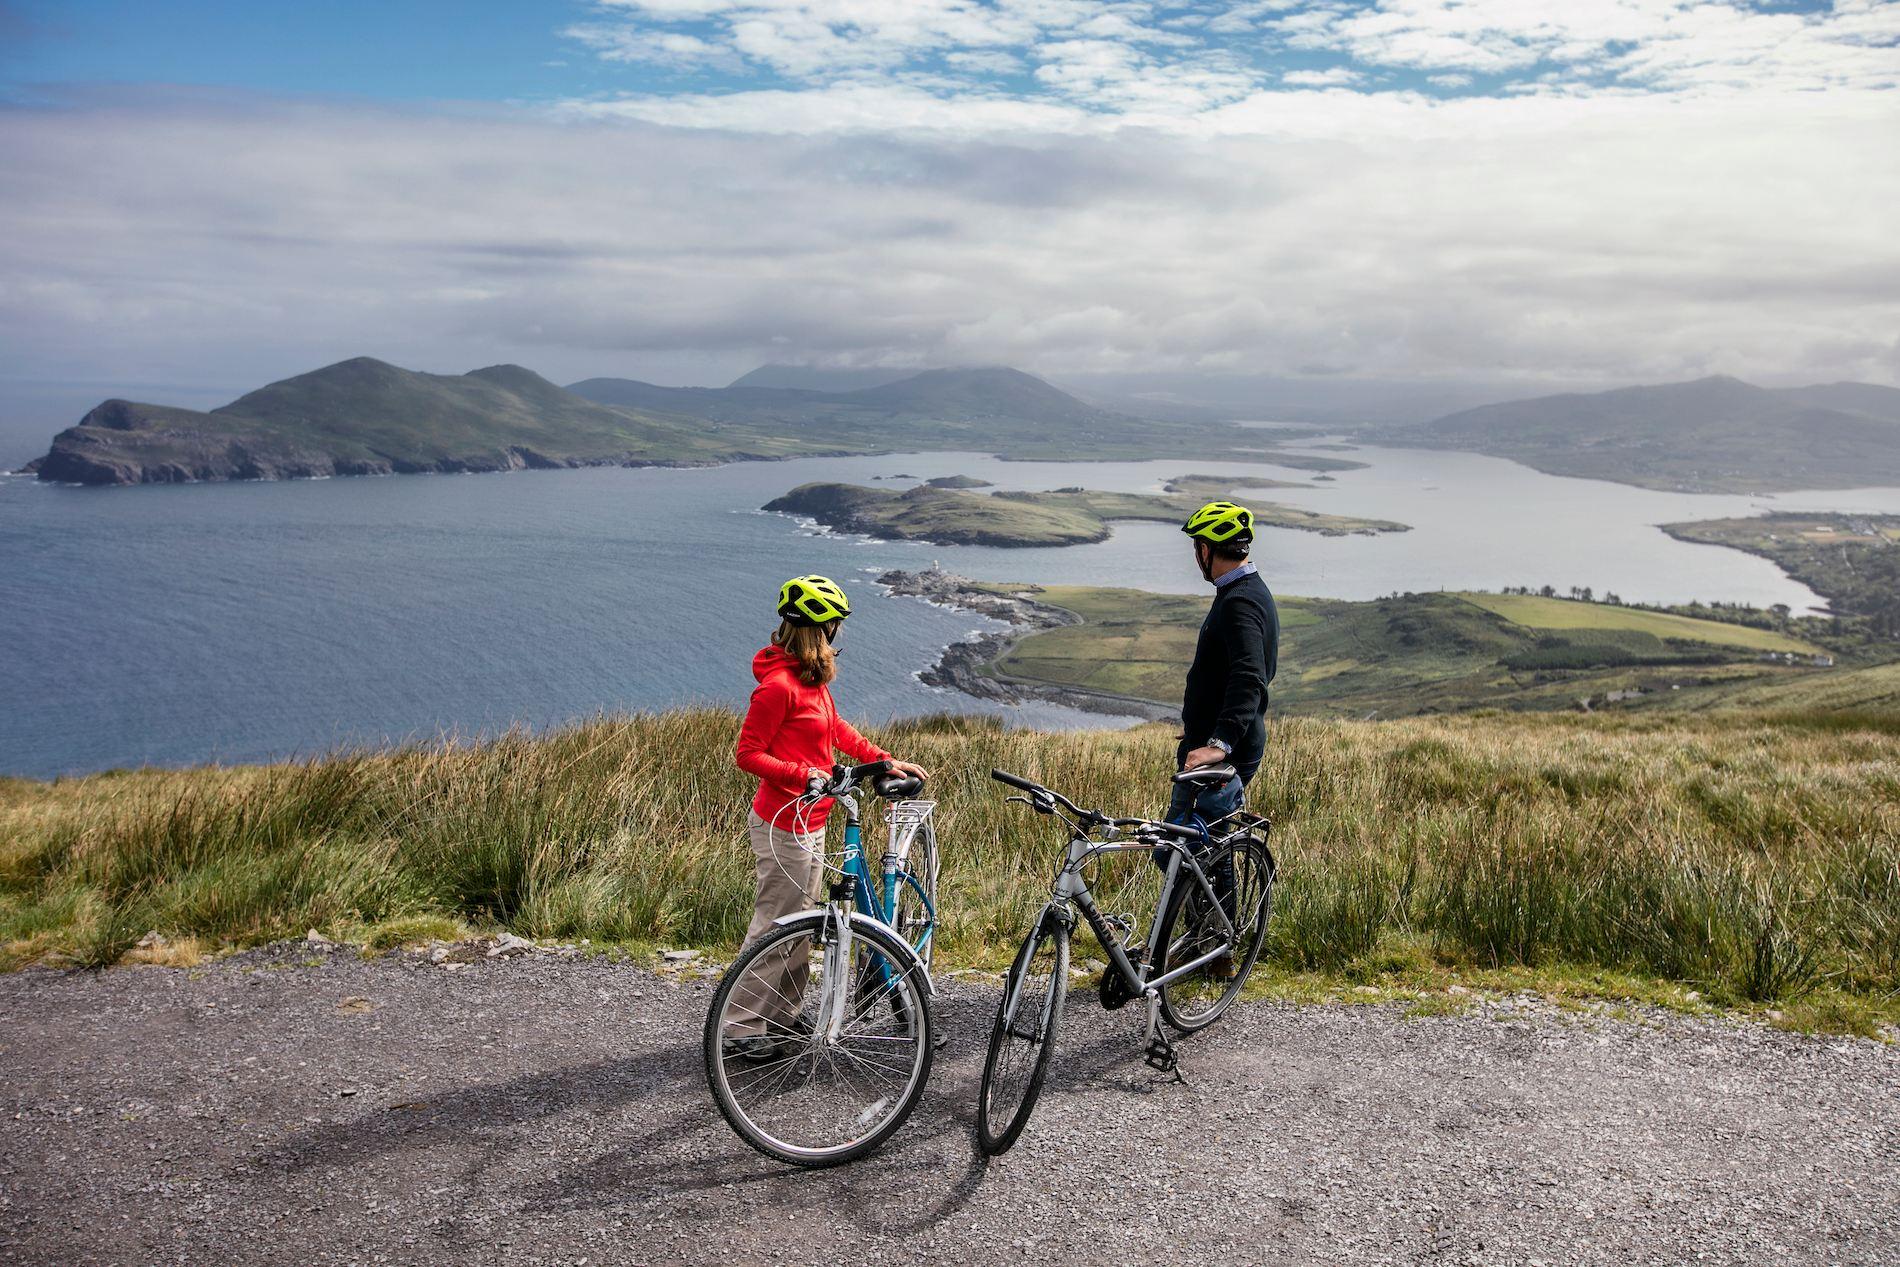 Unique honeymoon ideas - Cycling in Ireland